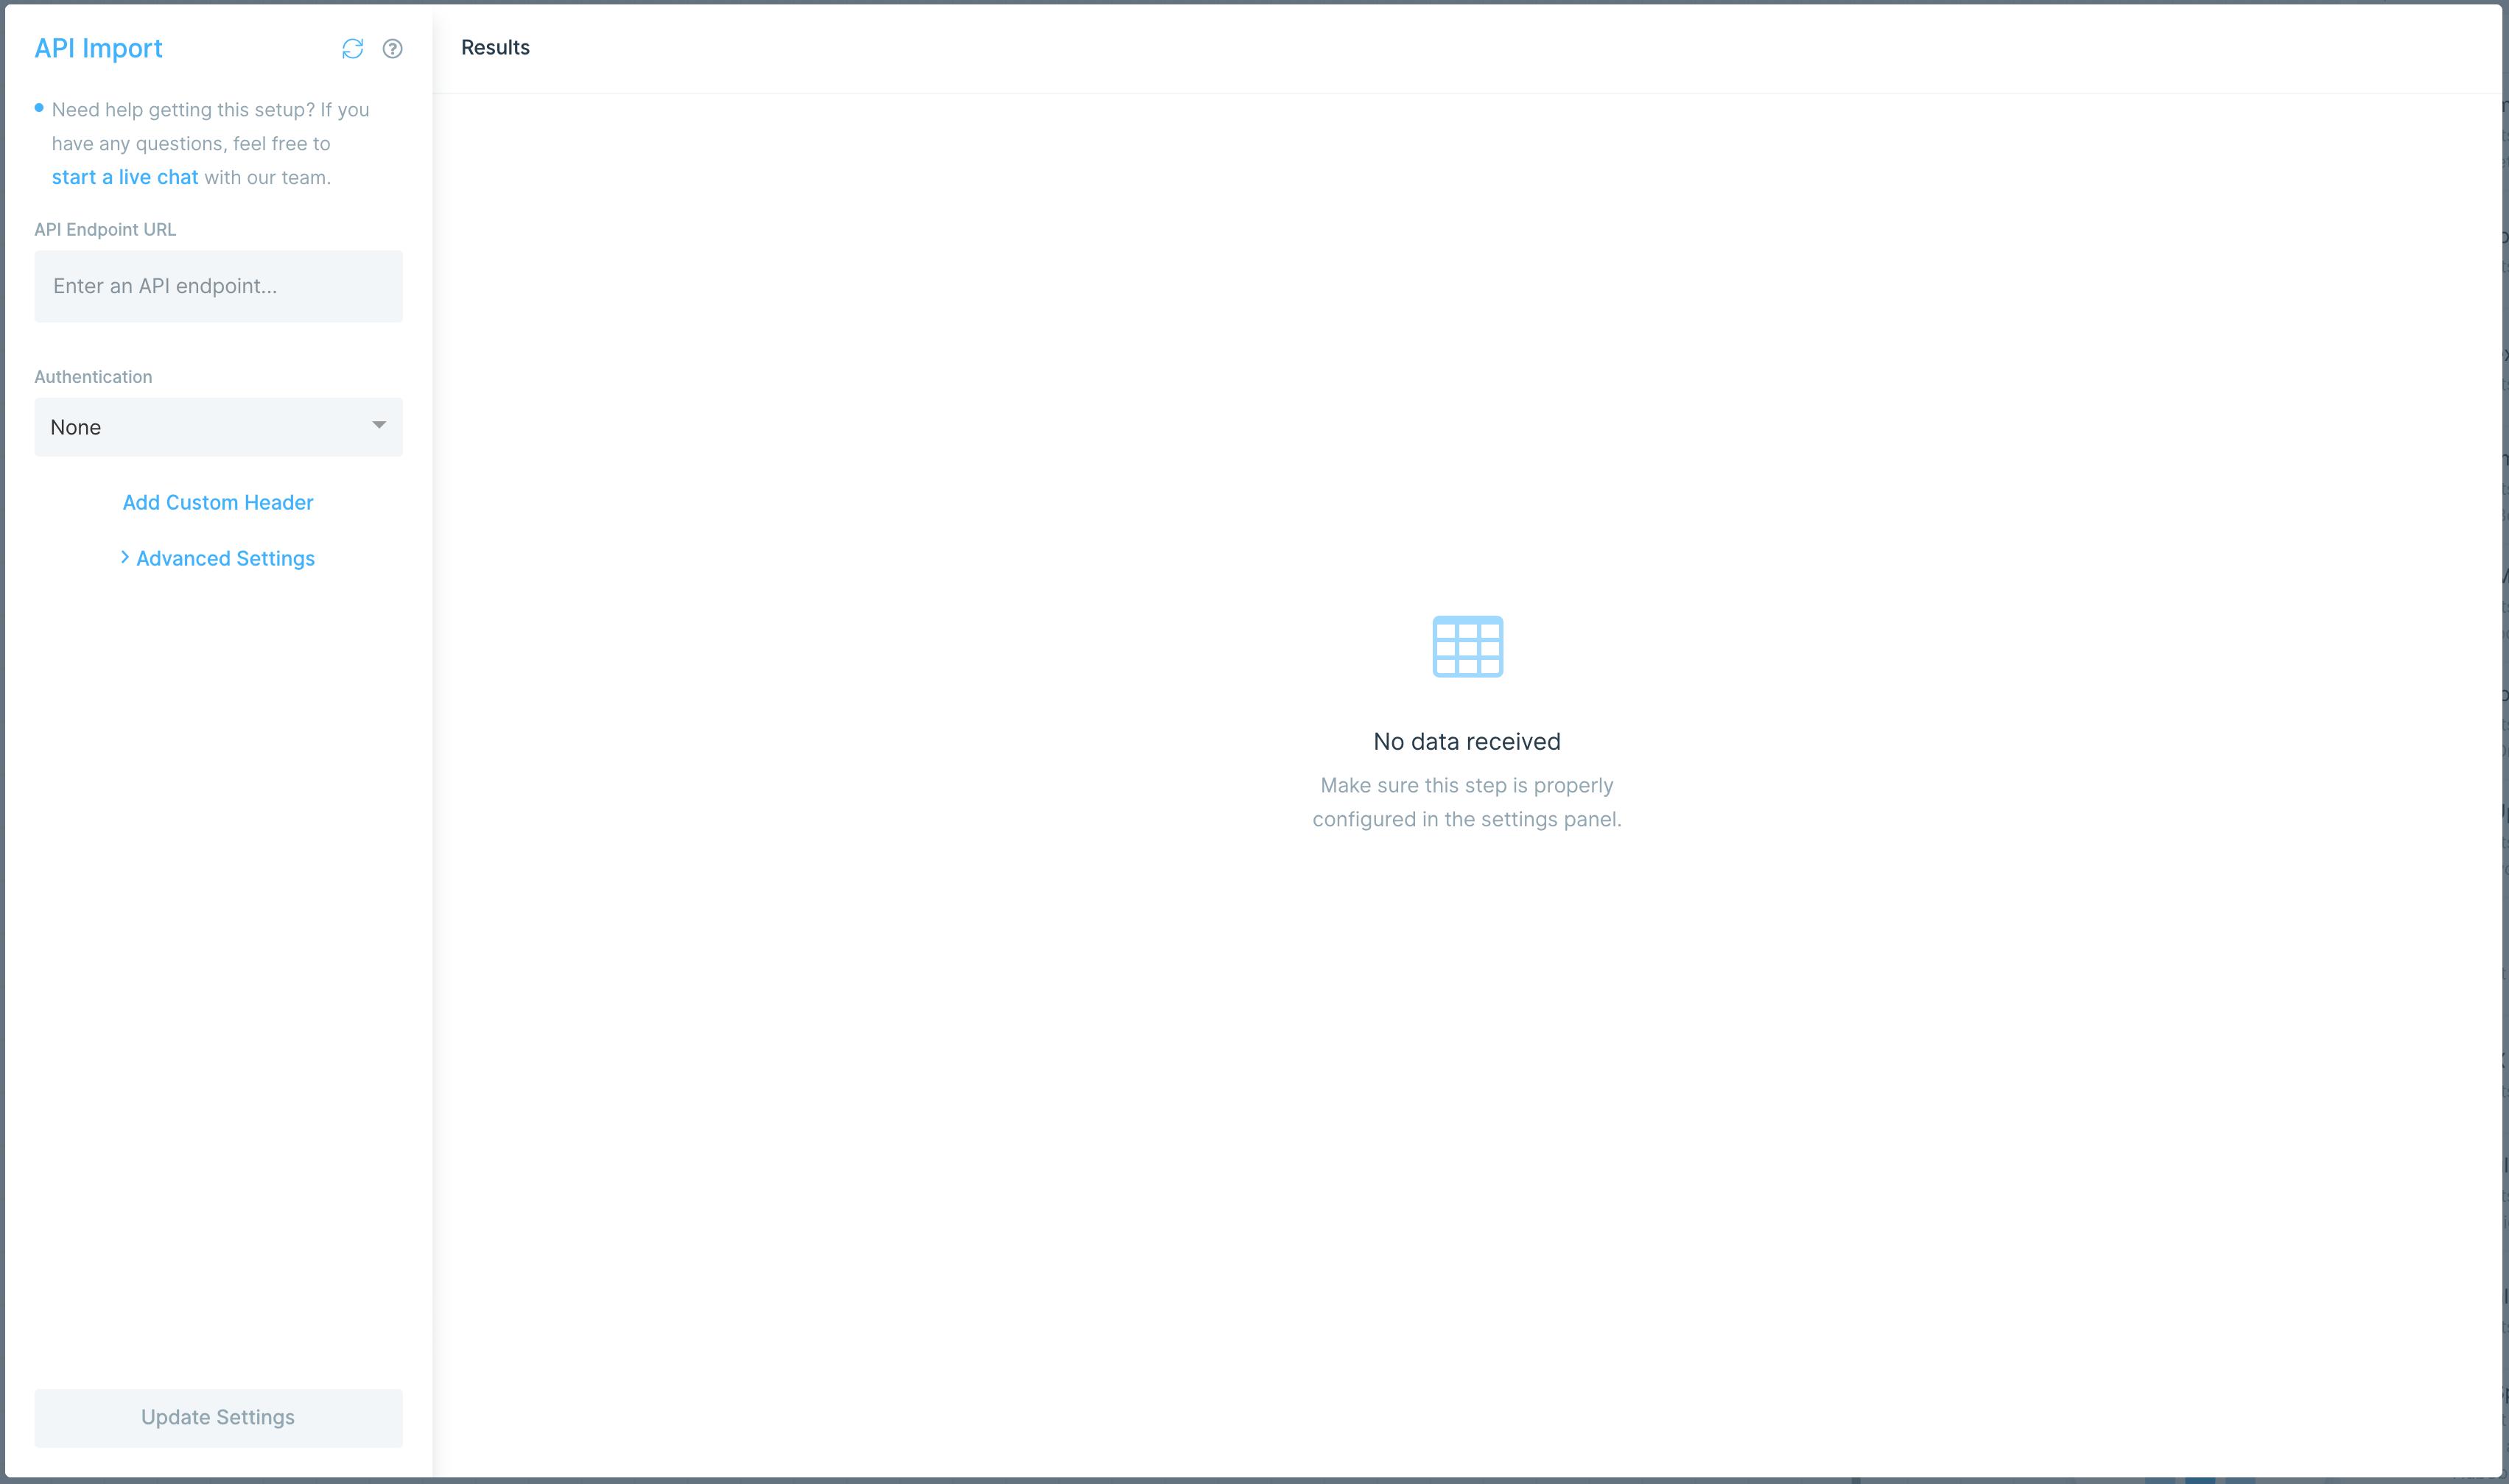 API Import settings